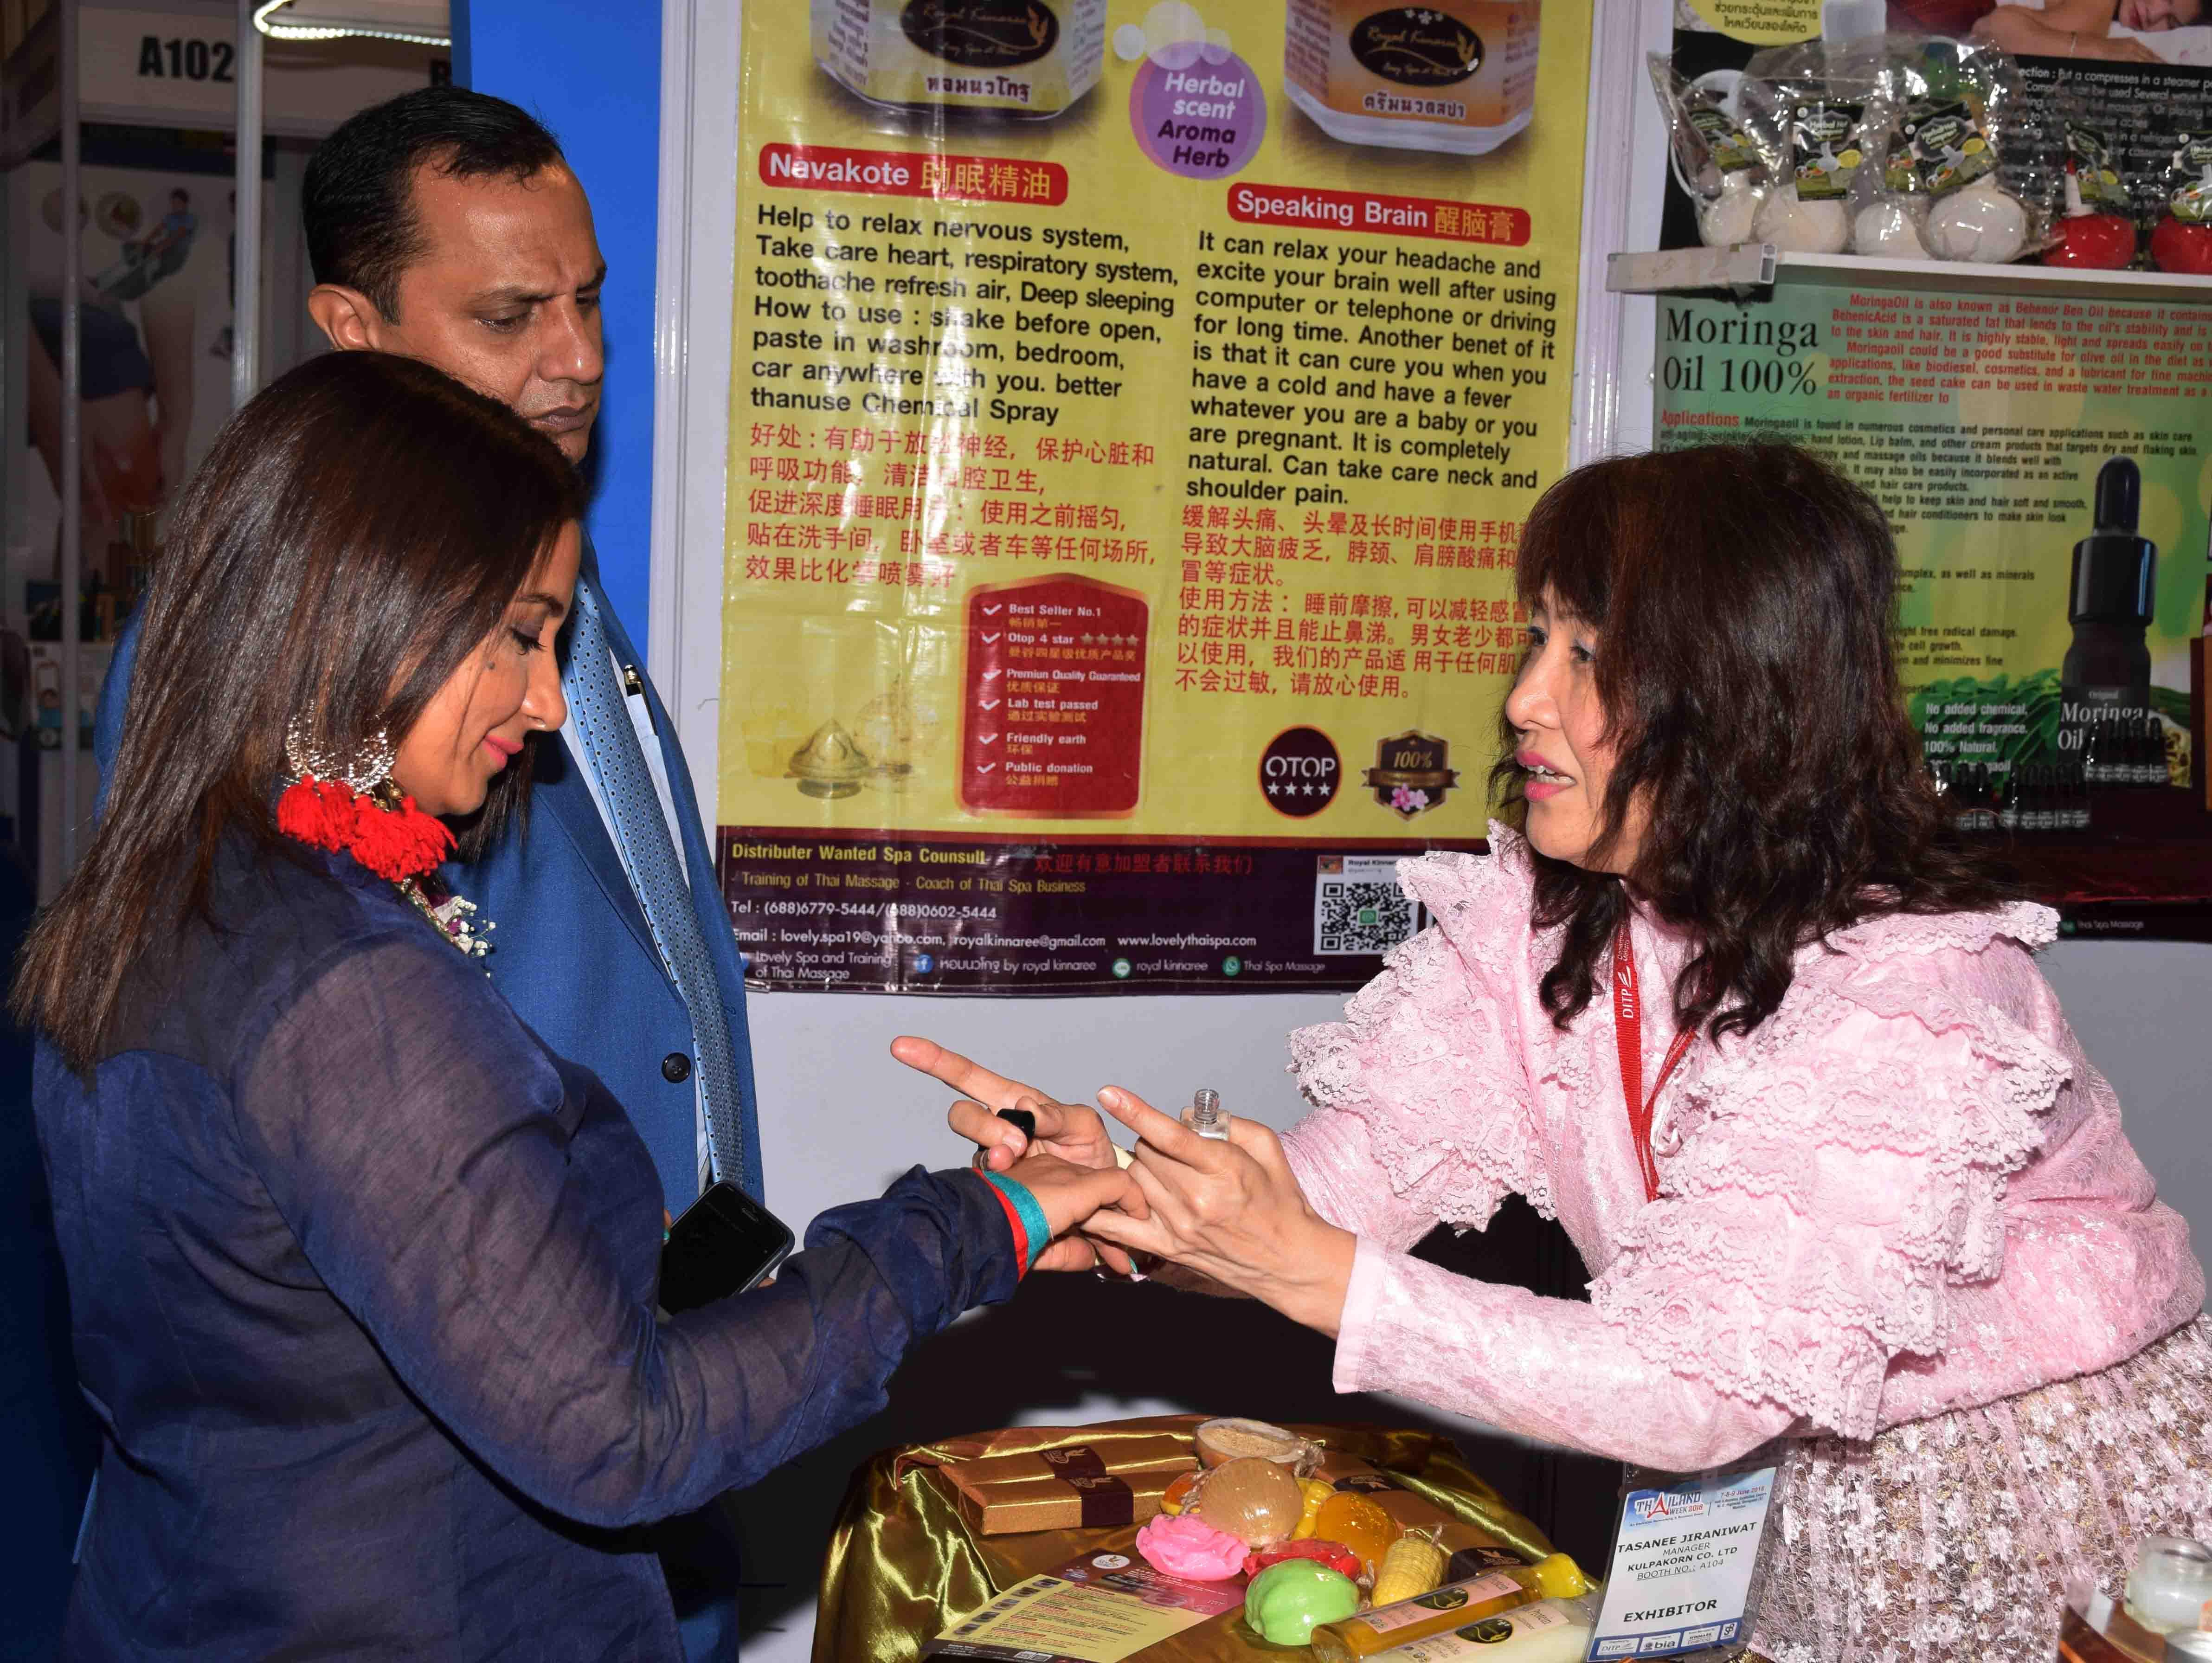 Bollywood actress Divya Dutta inaugurated the Thailand Week 2018 at Bombay Exhibition Centre, Goregaon in Mumbai5